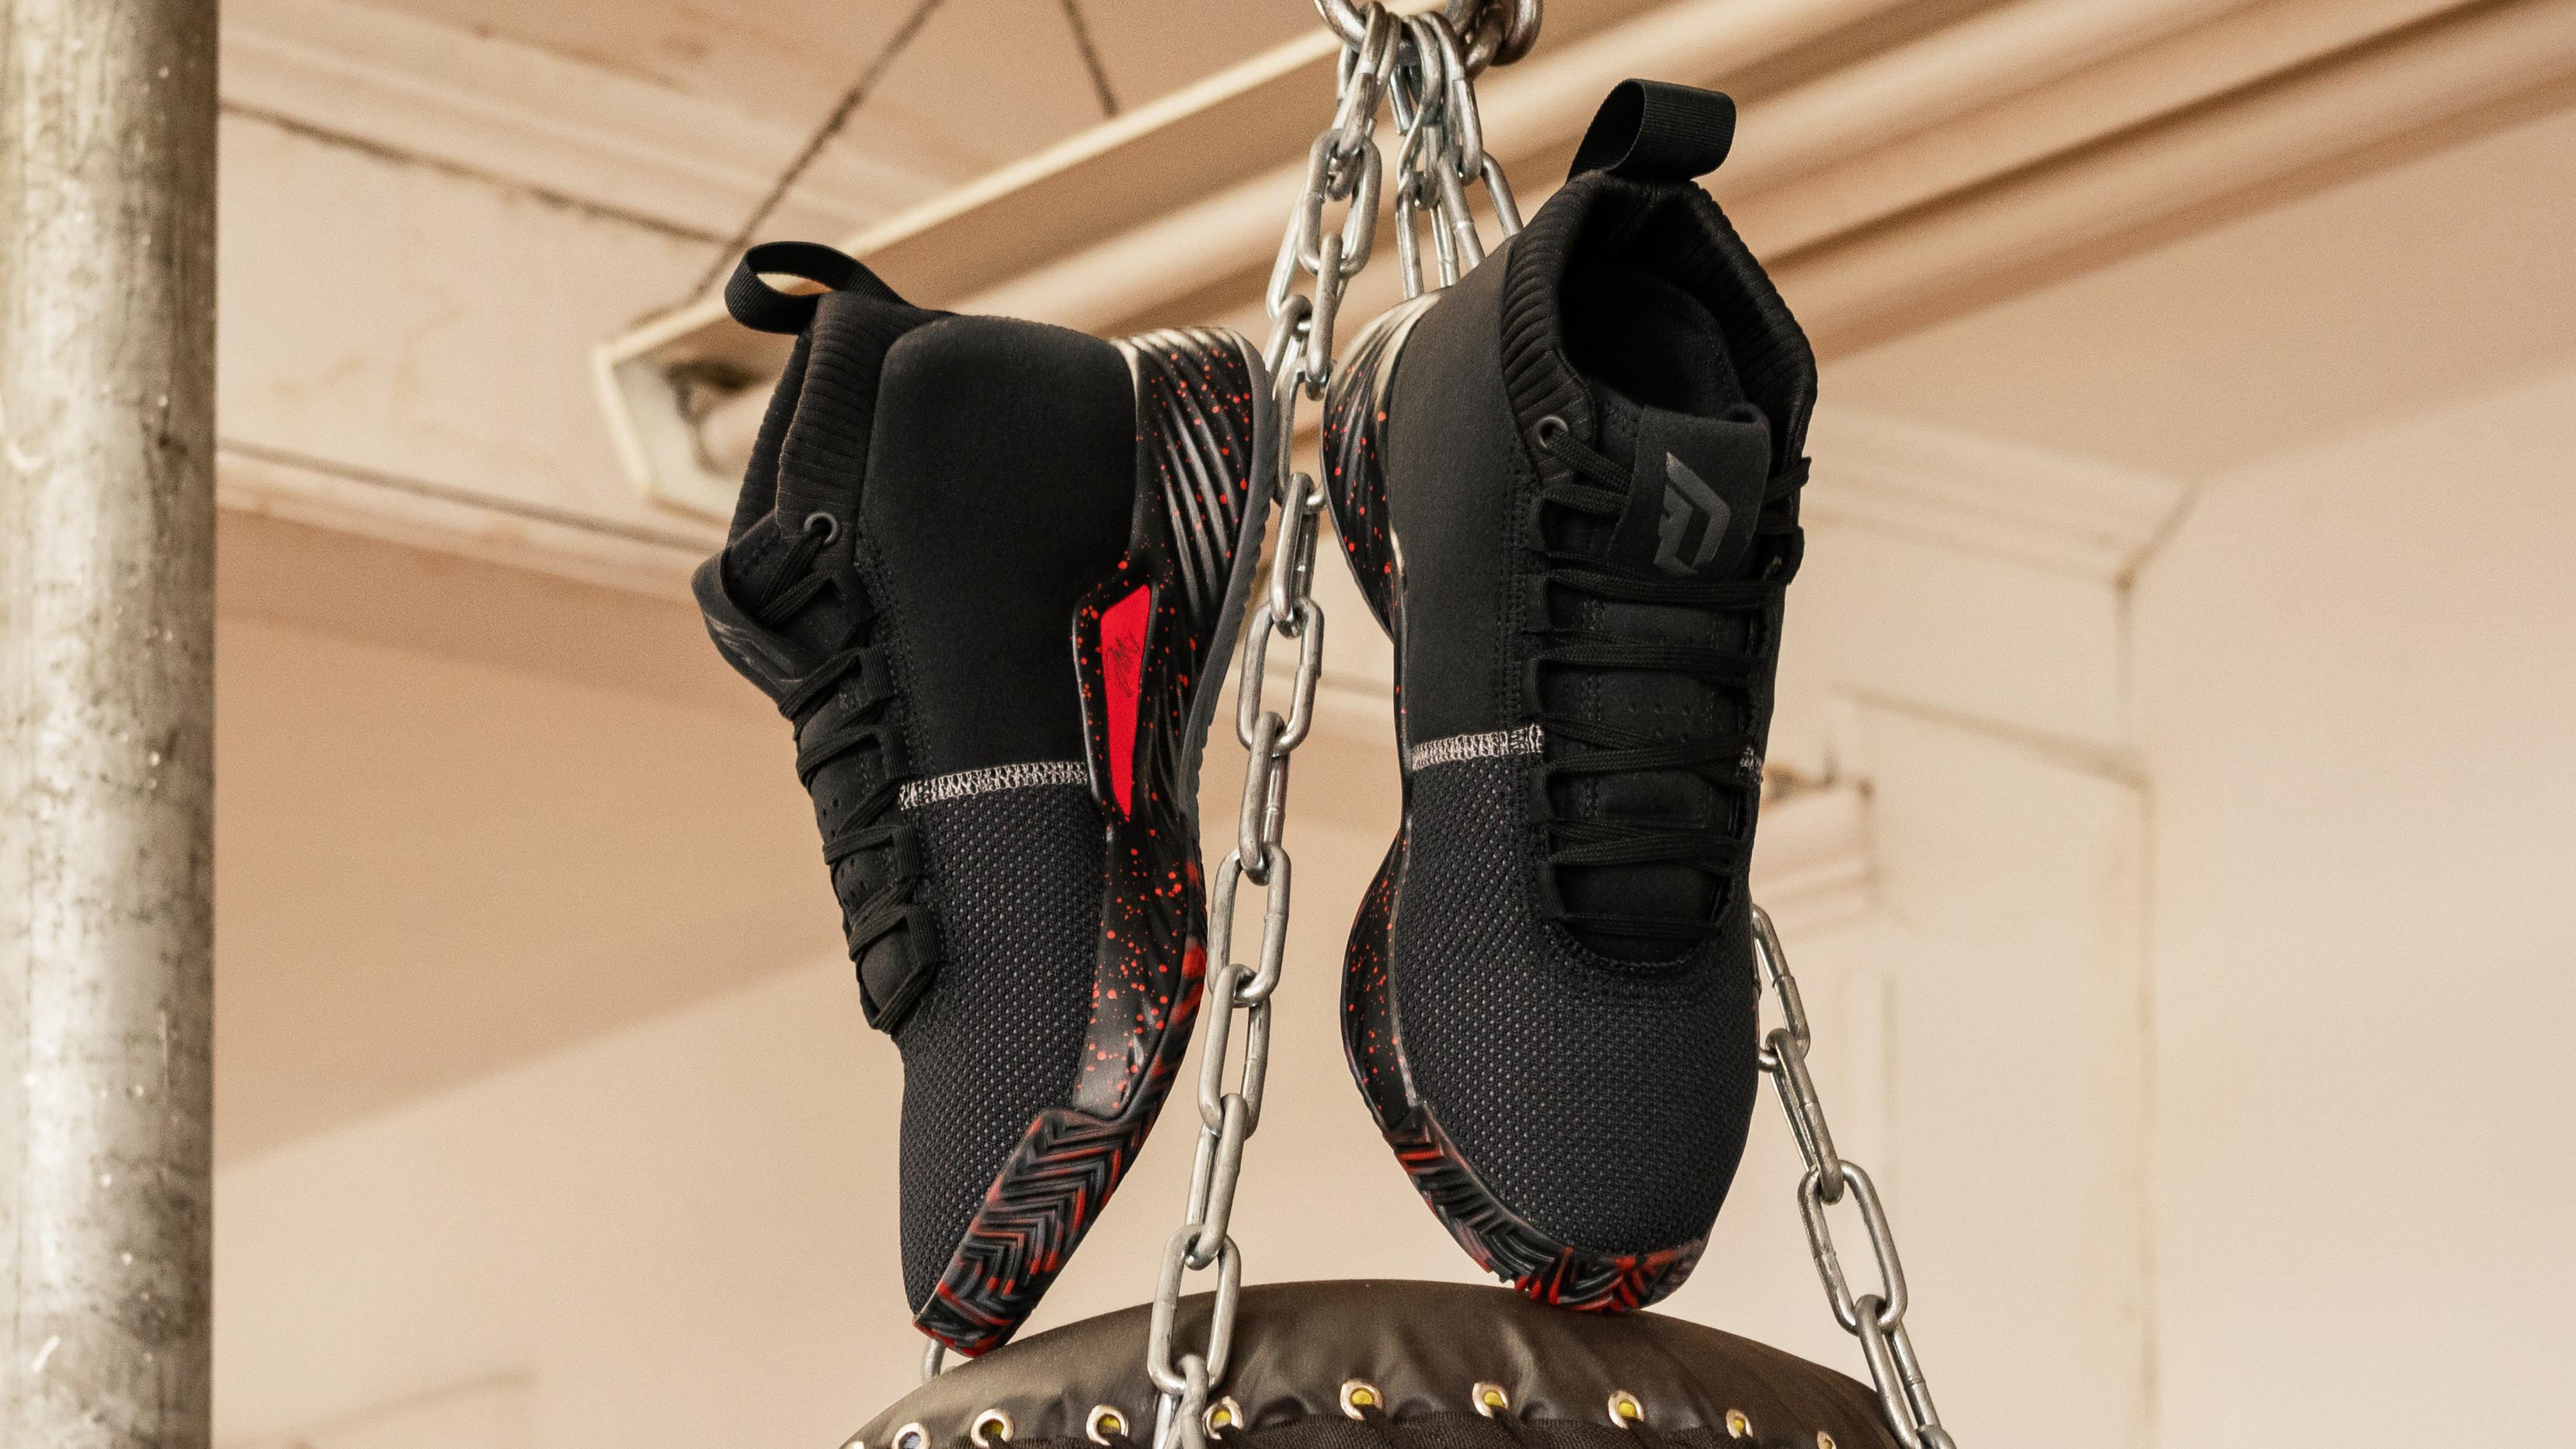 hot sale online 018b3 15656 Adidas Damian Lillard Dame 5 Release Date Feb. 1, 2019  Sole